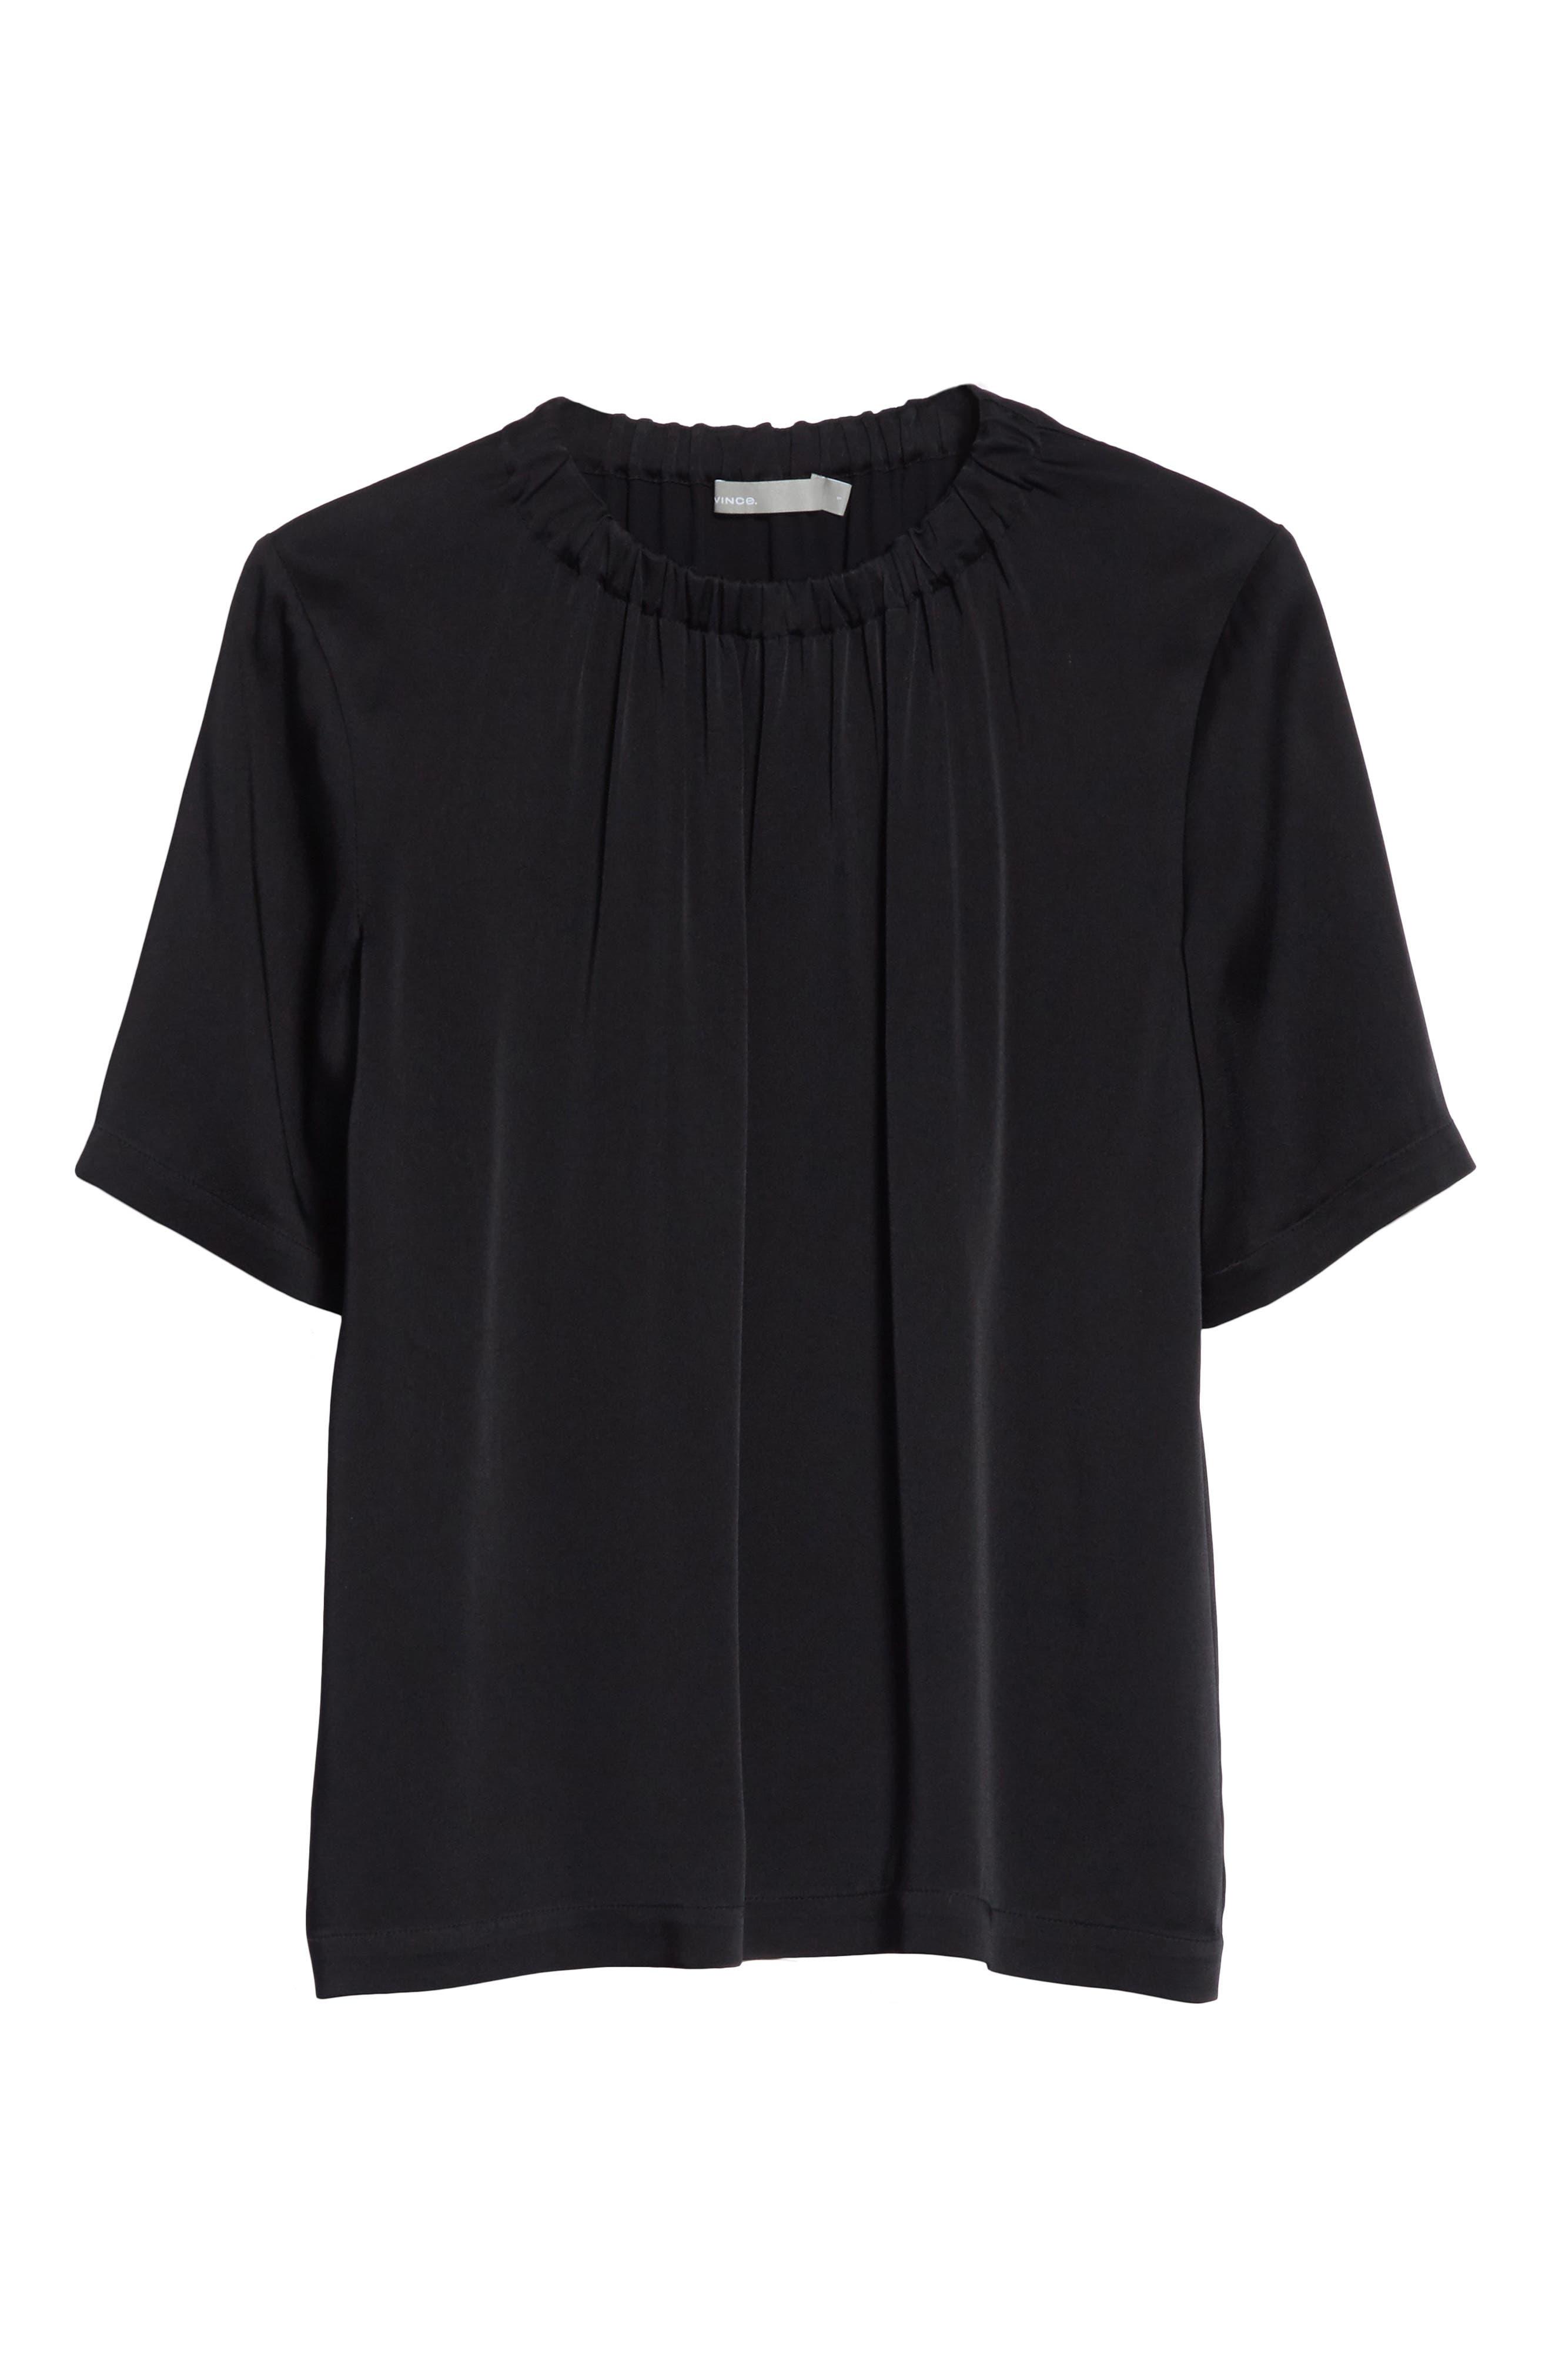 Gathered Neck Short Sleeve Top,                             Alternate thumbnail 6, color,                             Black